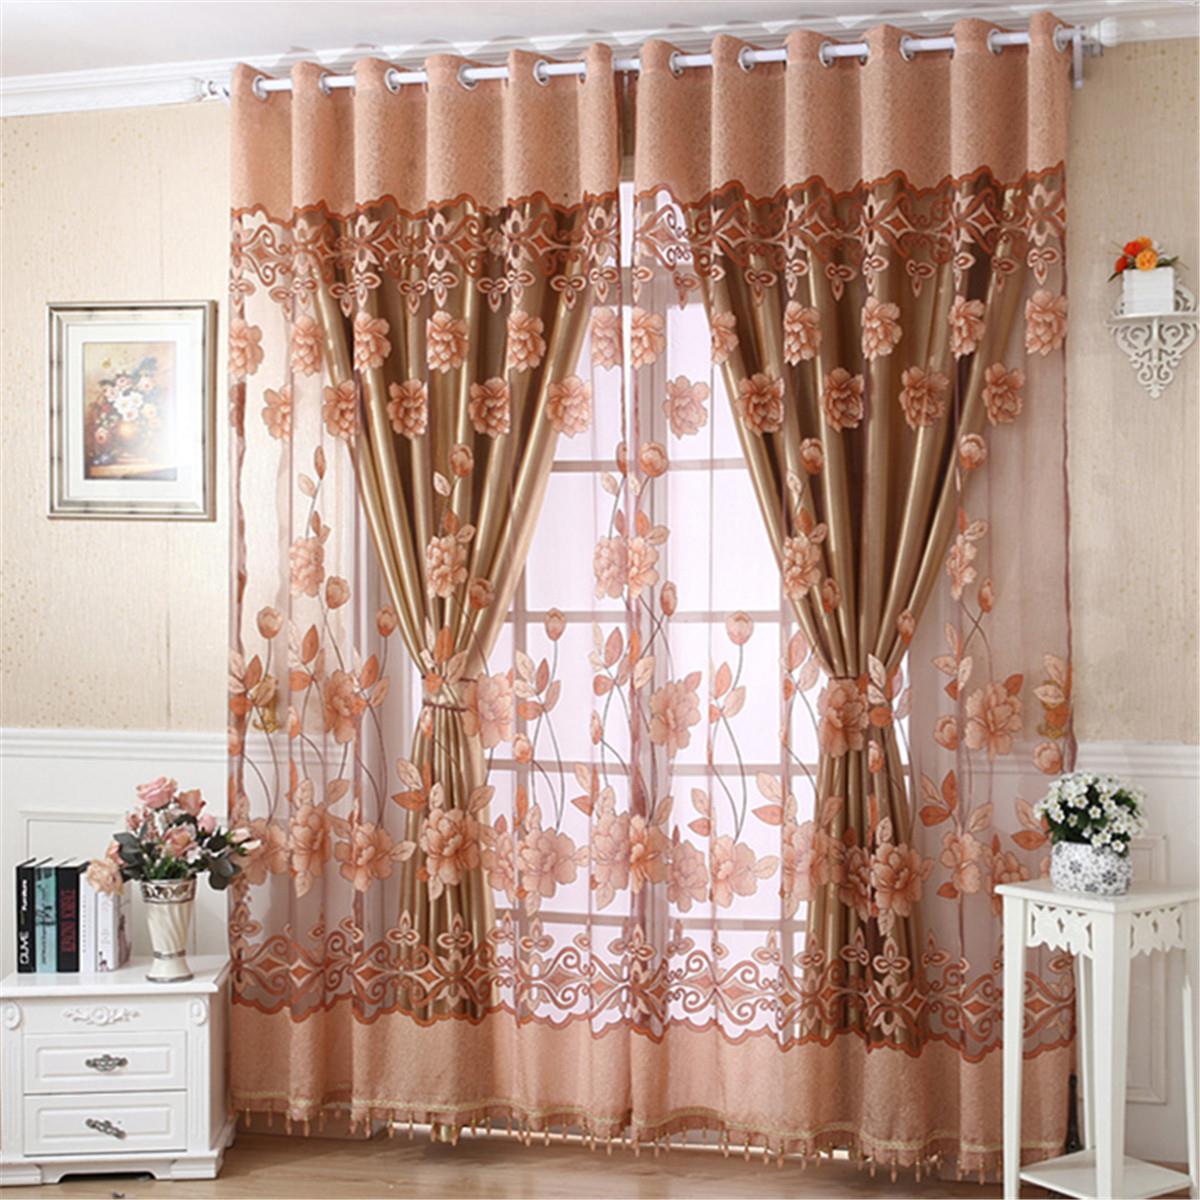 Elegant Flower Print Tulle Door Drape Window Curtain Home Panel Sheer Scarf Valances Living Room Bedroom